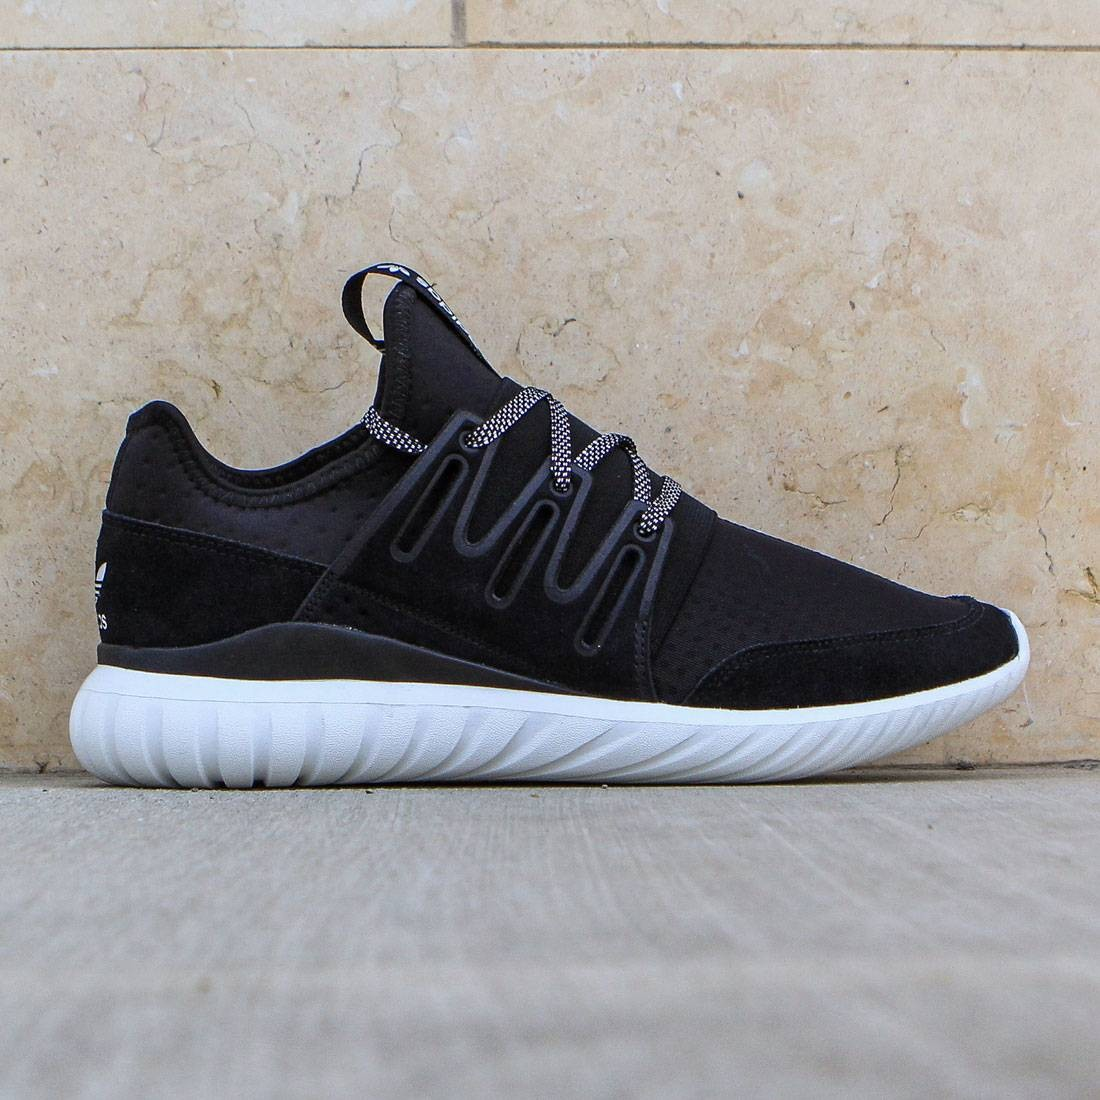 adidas Tubular Nova Primeknit Review On